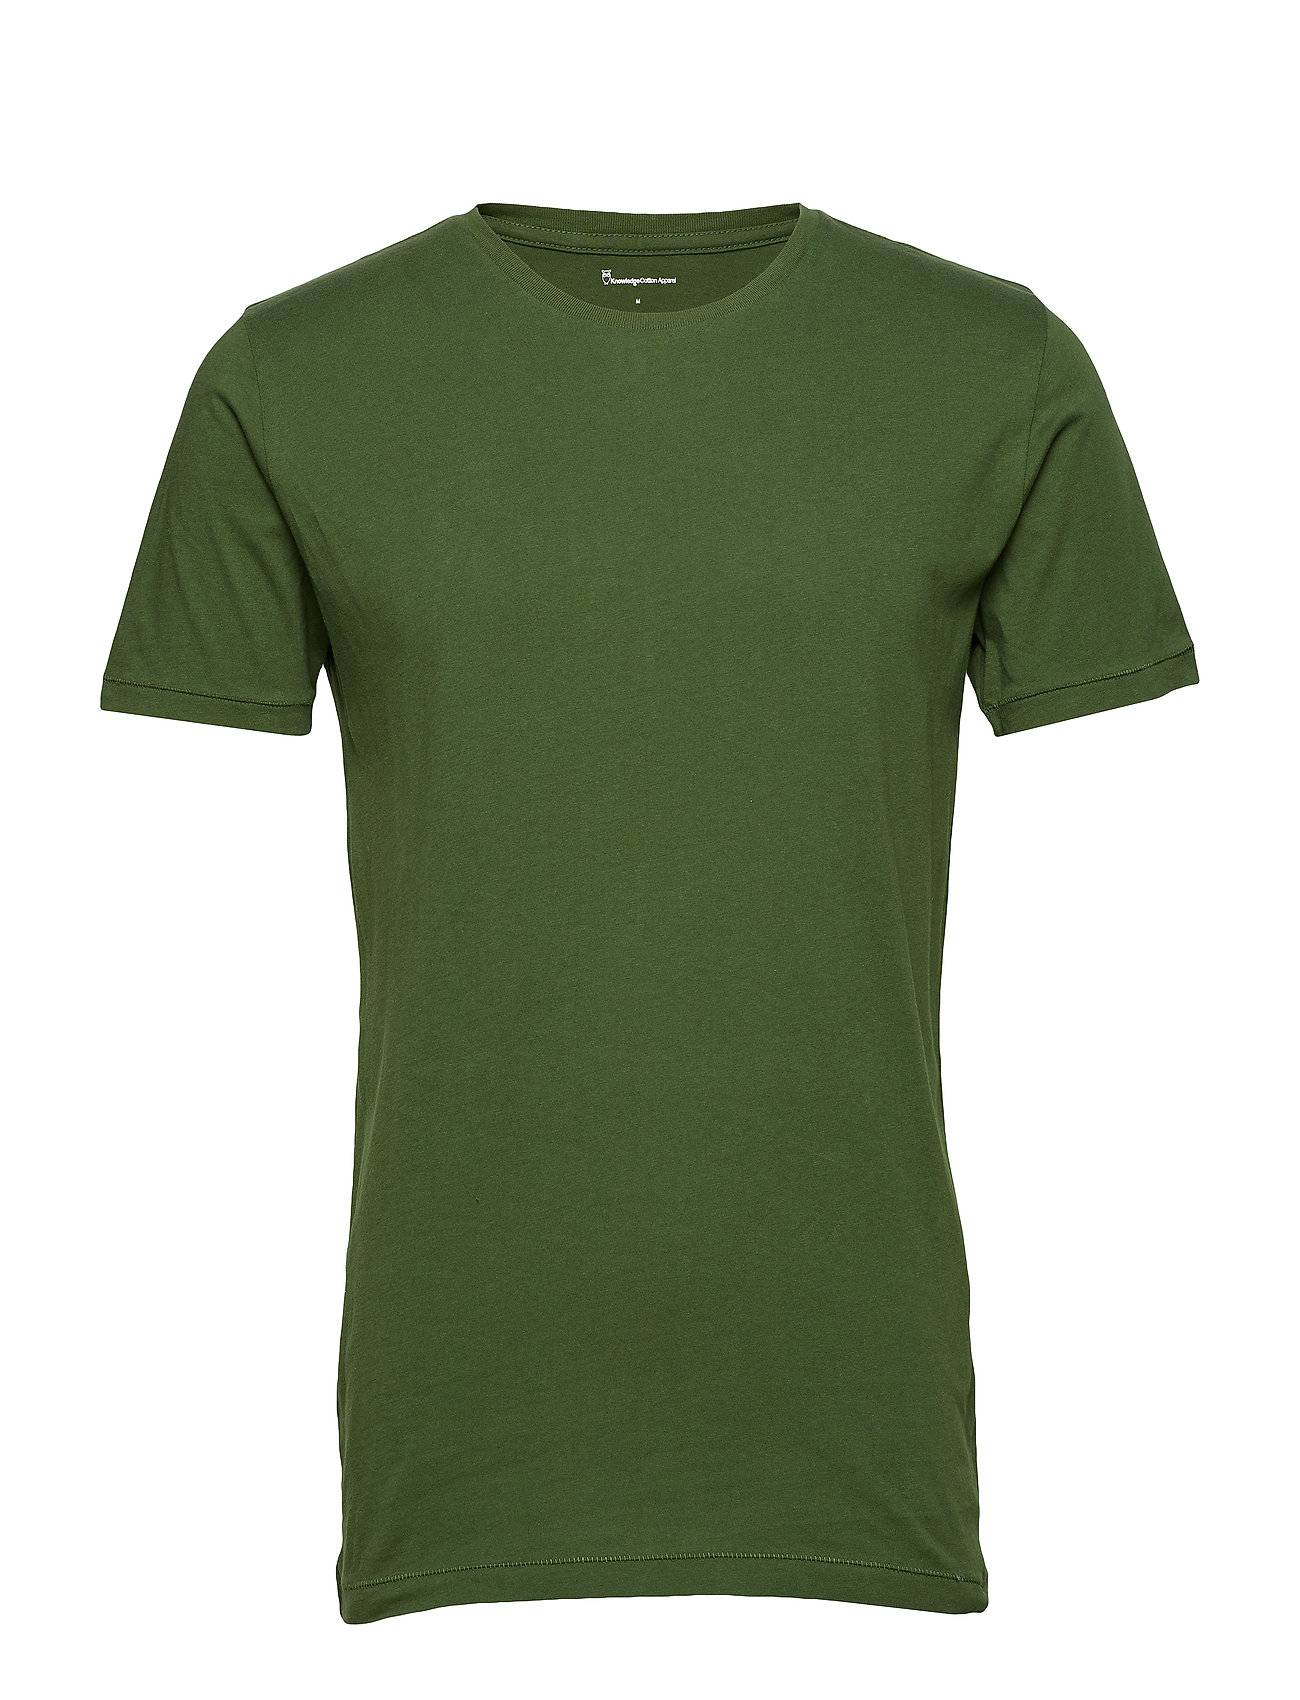 Knowledge Cotton Apparel Basic Regular Fit O-Neck Tee Gots/V